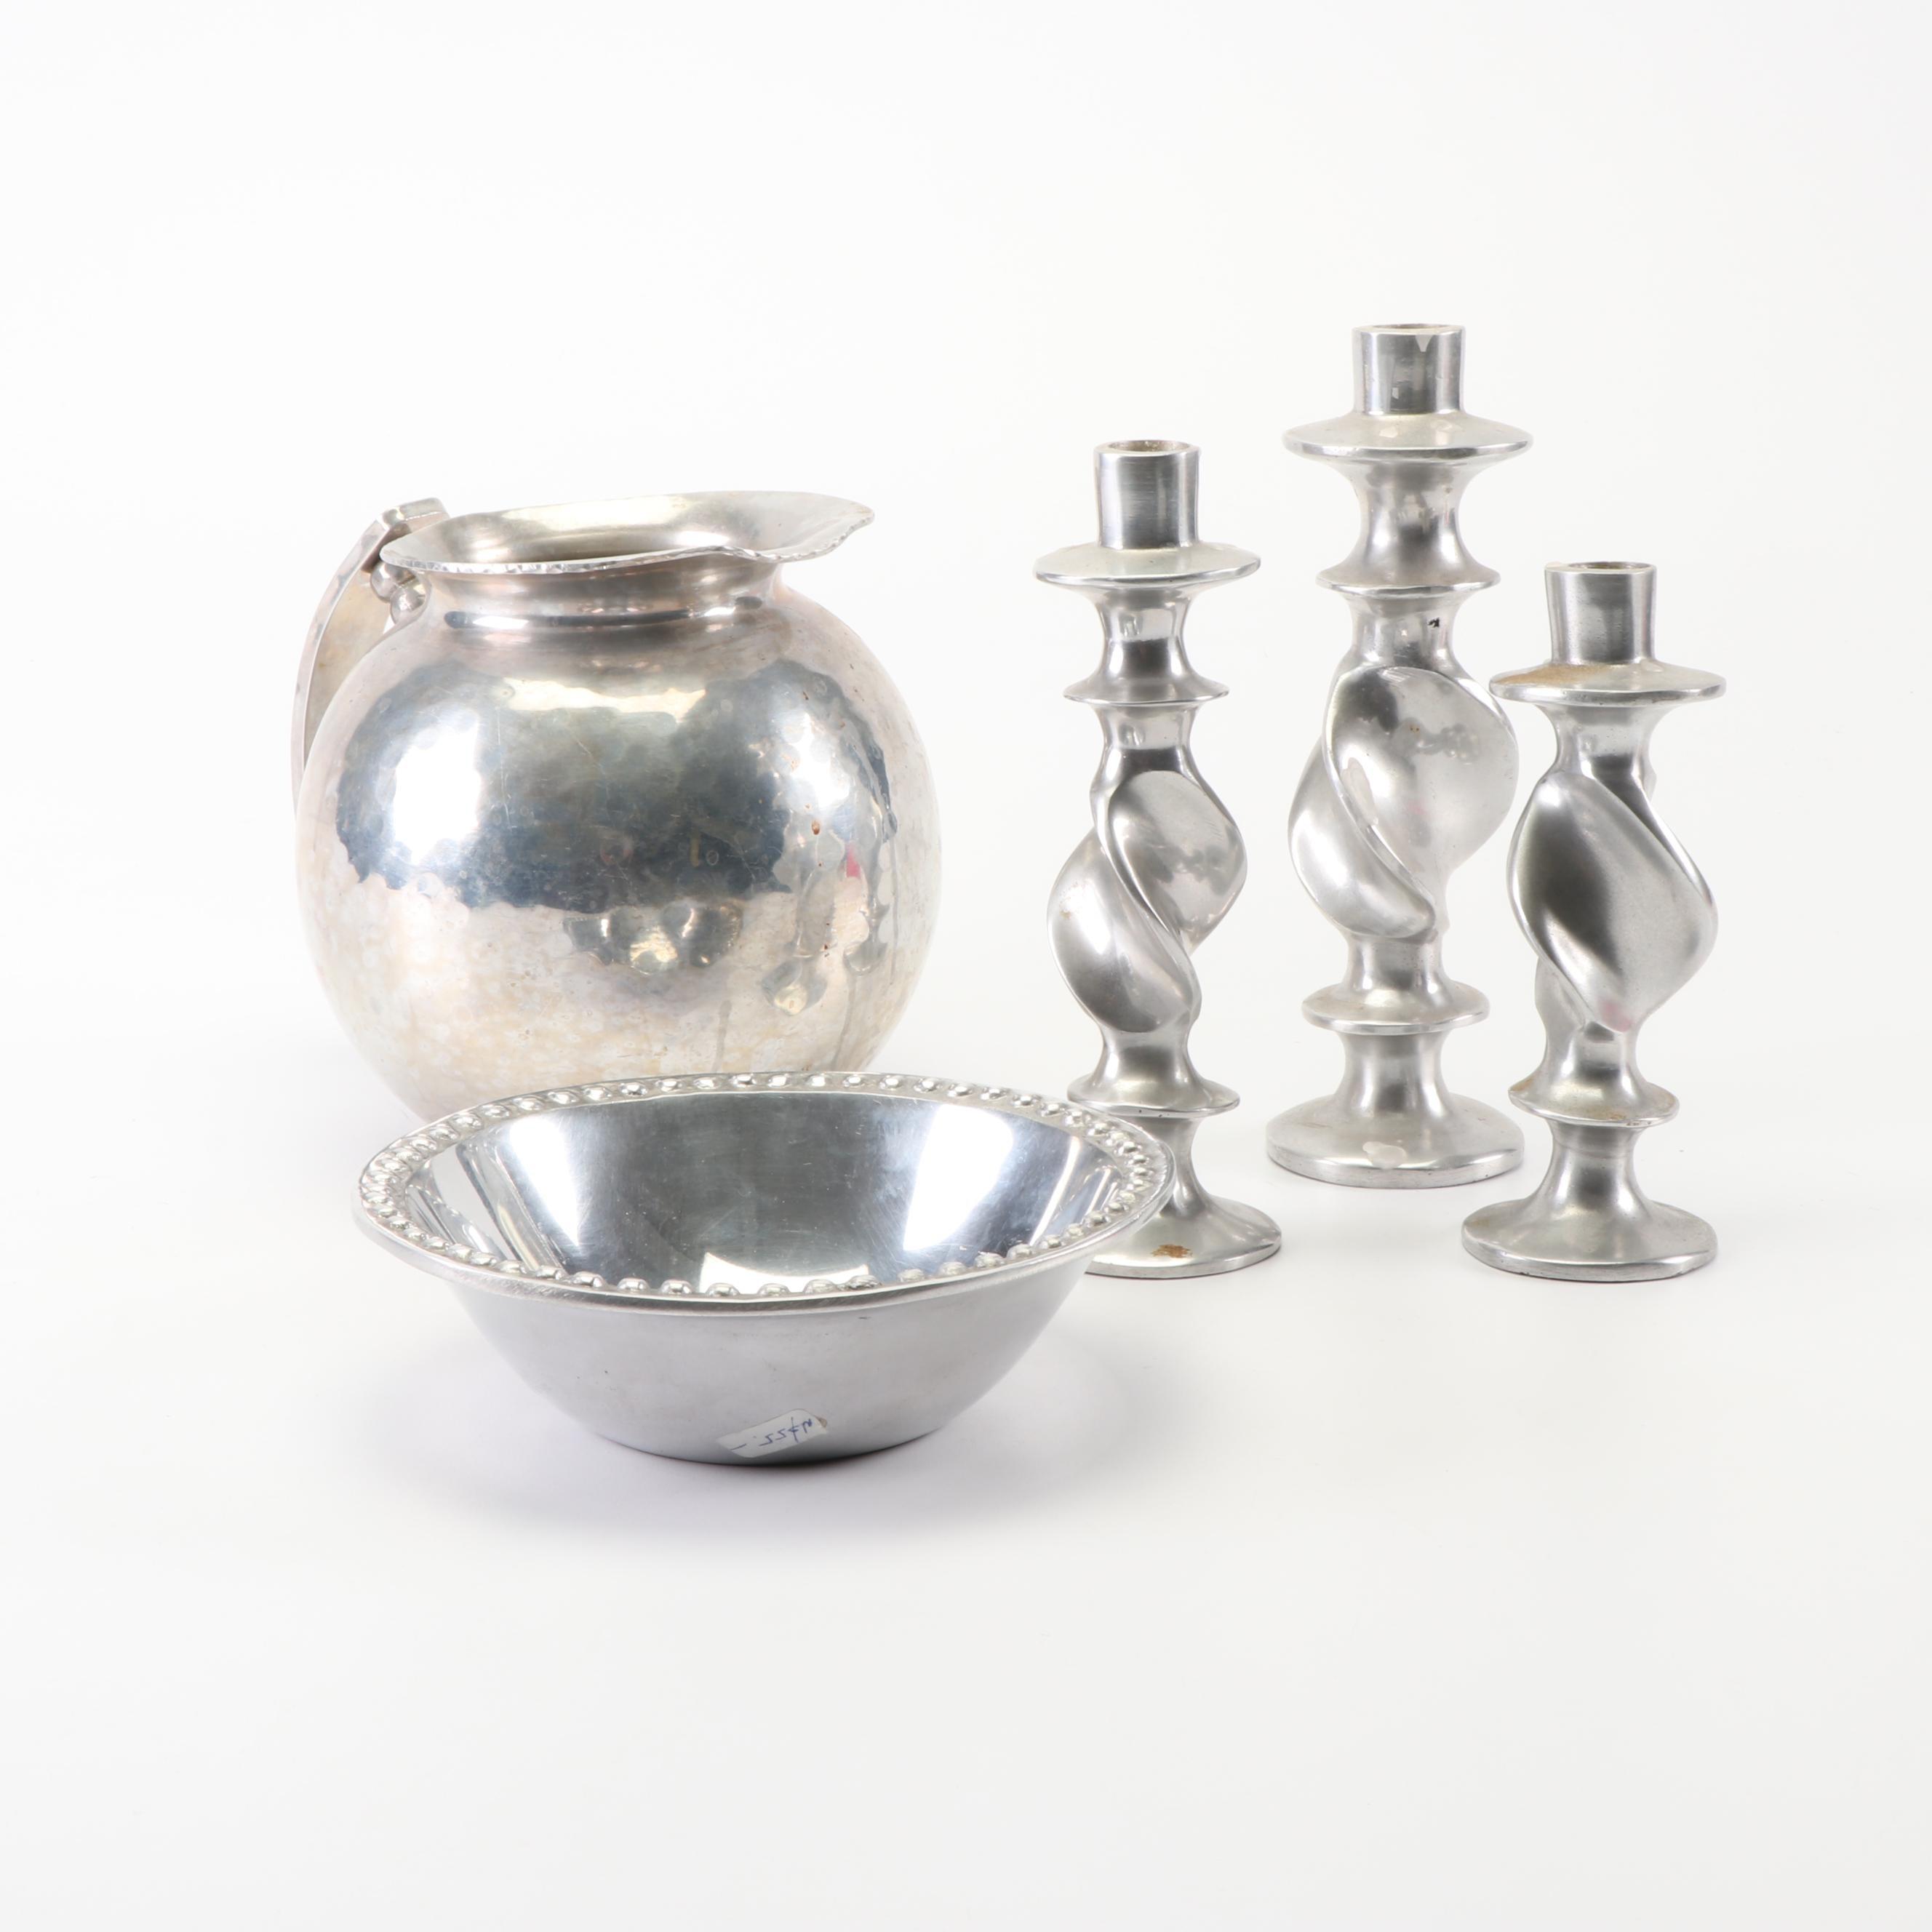 Aluminum Pitcher, Bowl, and Candlesticks featuring Buenilum